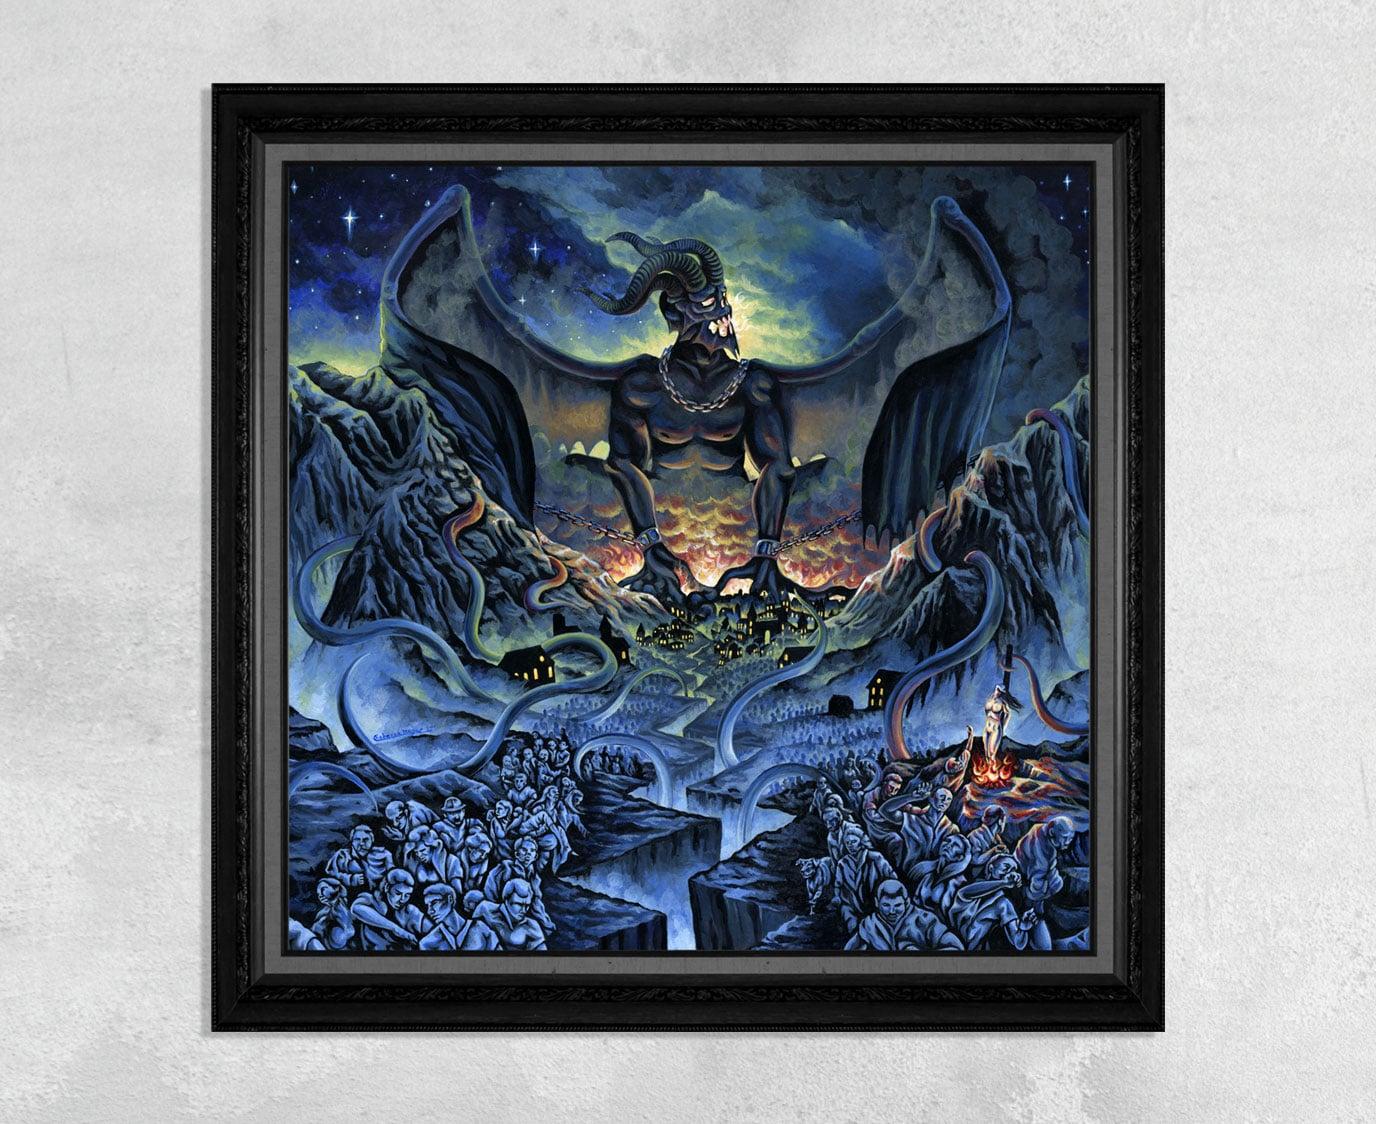 Demon Monster Attacking a Kingdom Print by Rebecca Magar